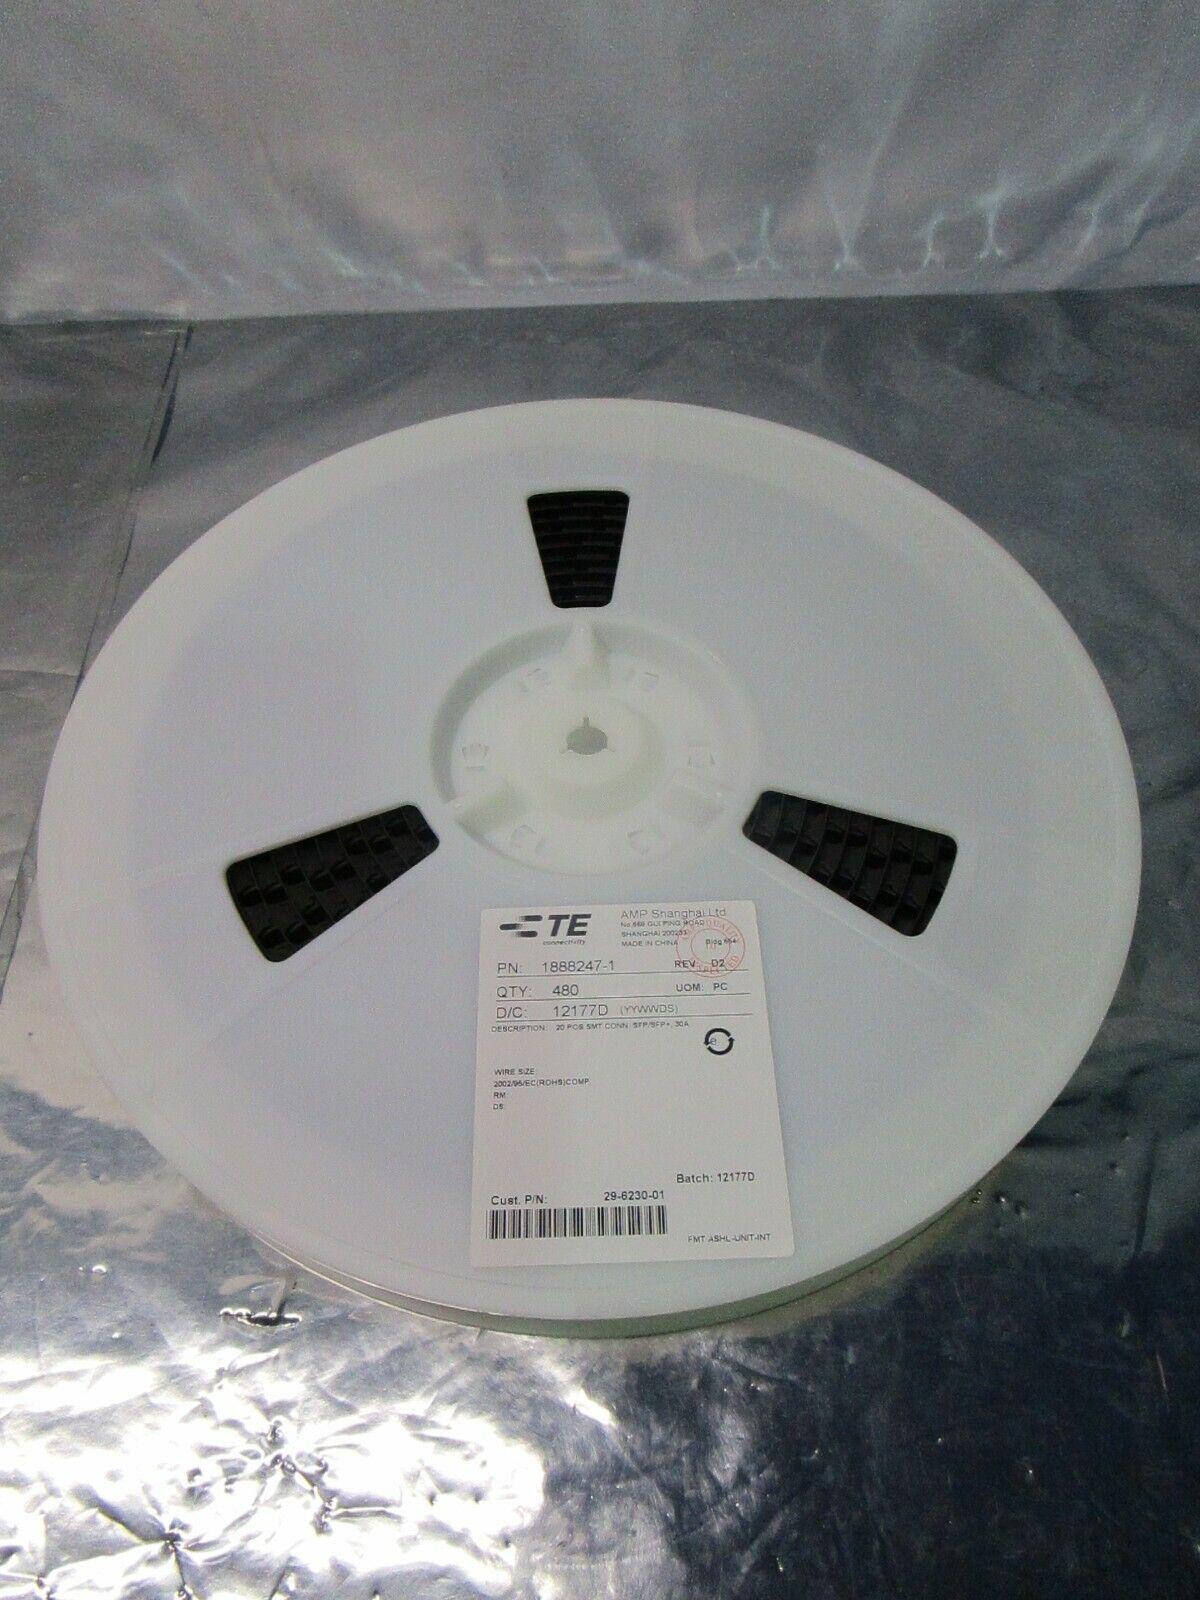 1 Lot of 480 TE connectivity 1888247-1 I/O Connectors 20 POS SMT 30um, 102588